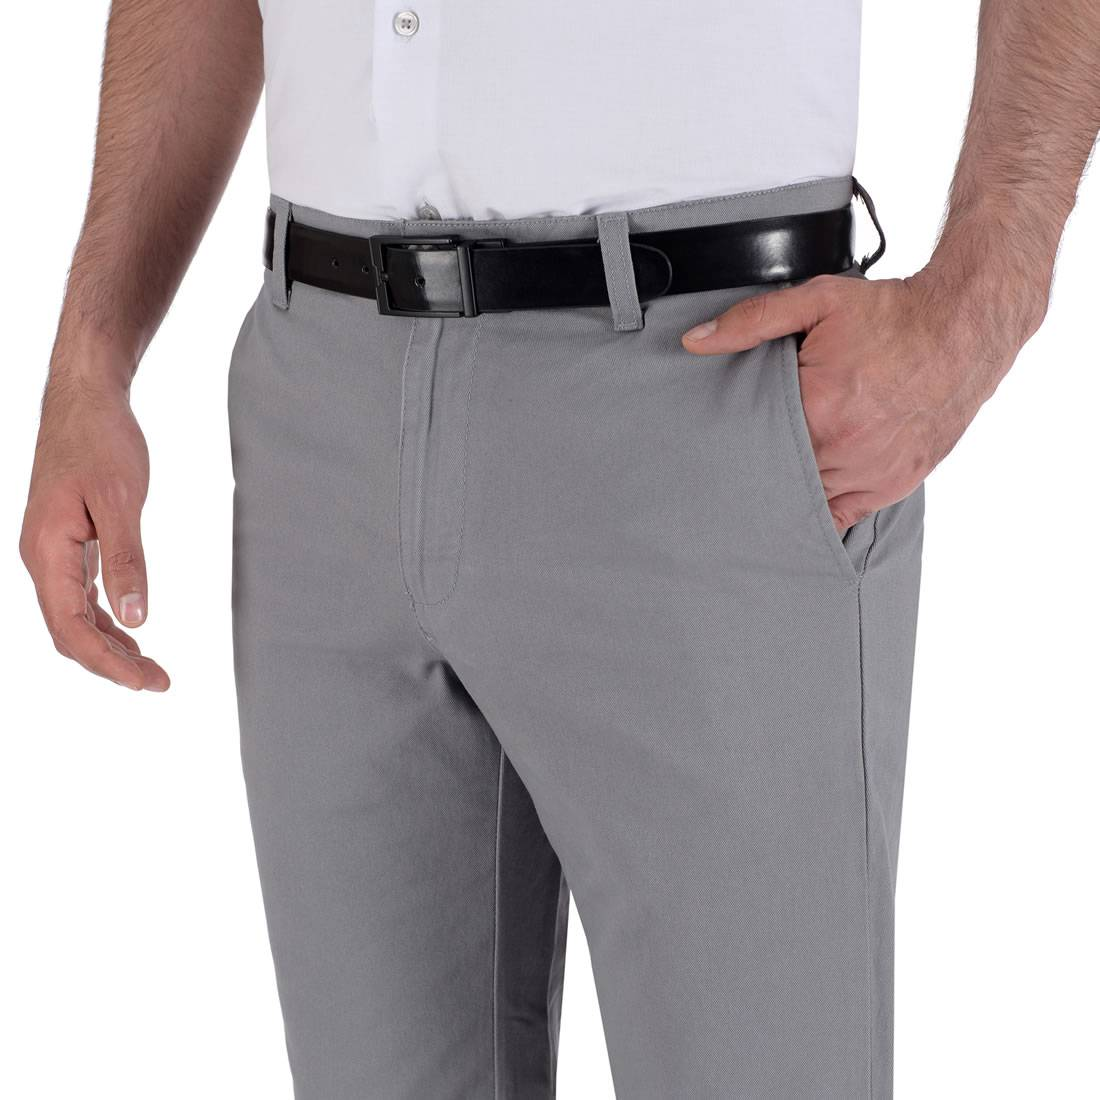 010811074406-03-Pantalon-Casual-Sin-Pinzas-Classic-Fit-Gris-yale